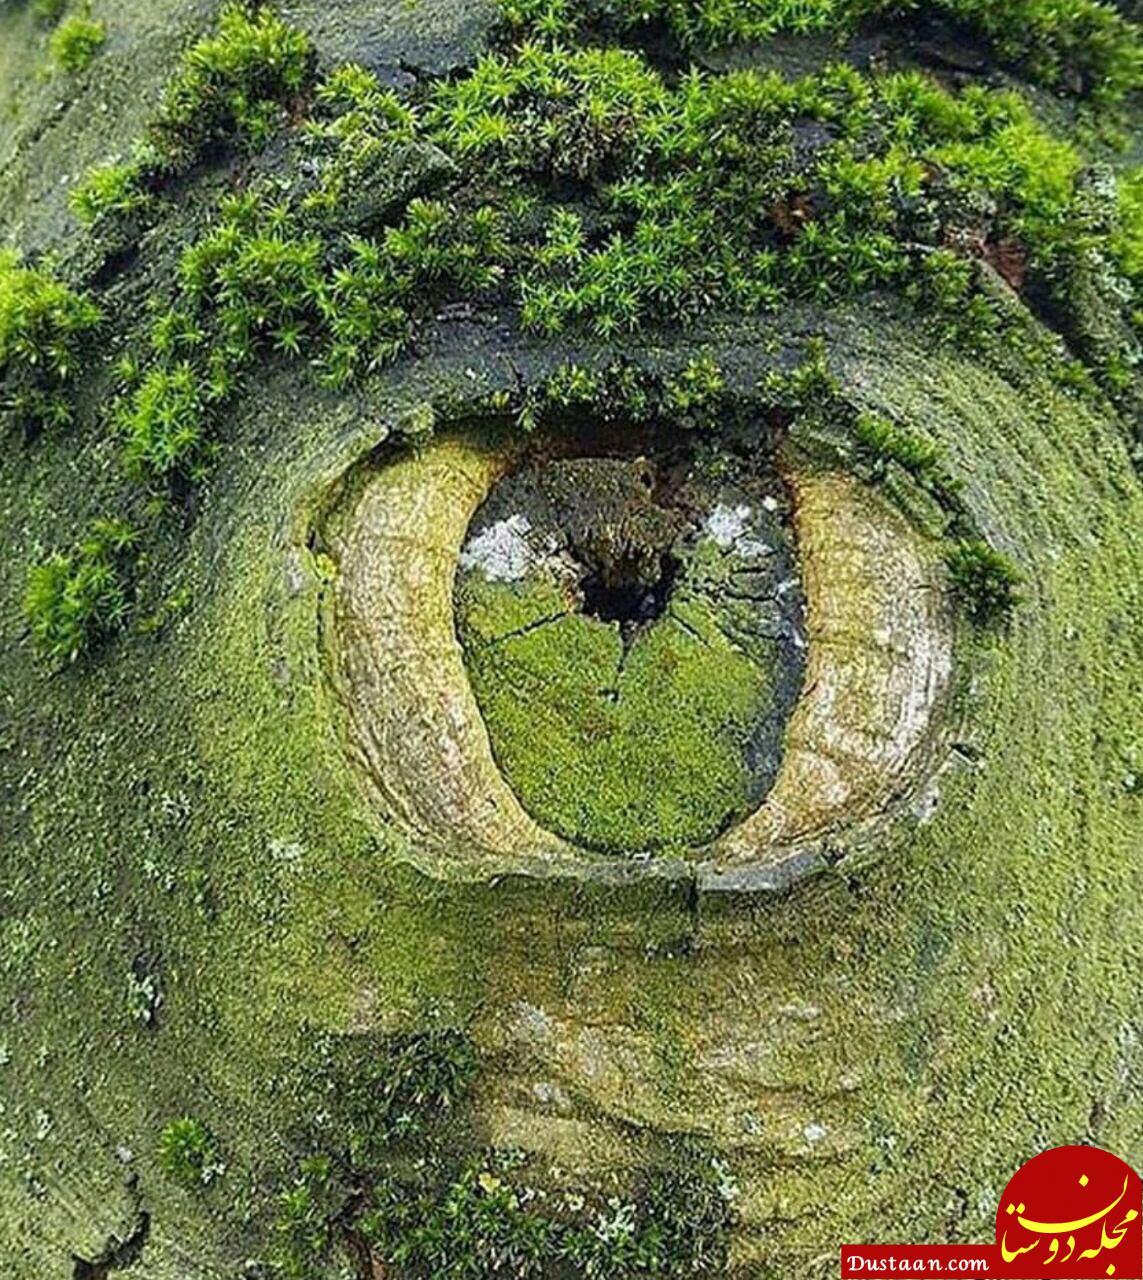 www.dustaan.com تصویری دیدنی از چشم زمین! +عکس